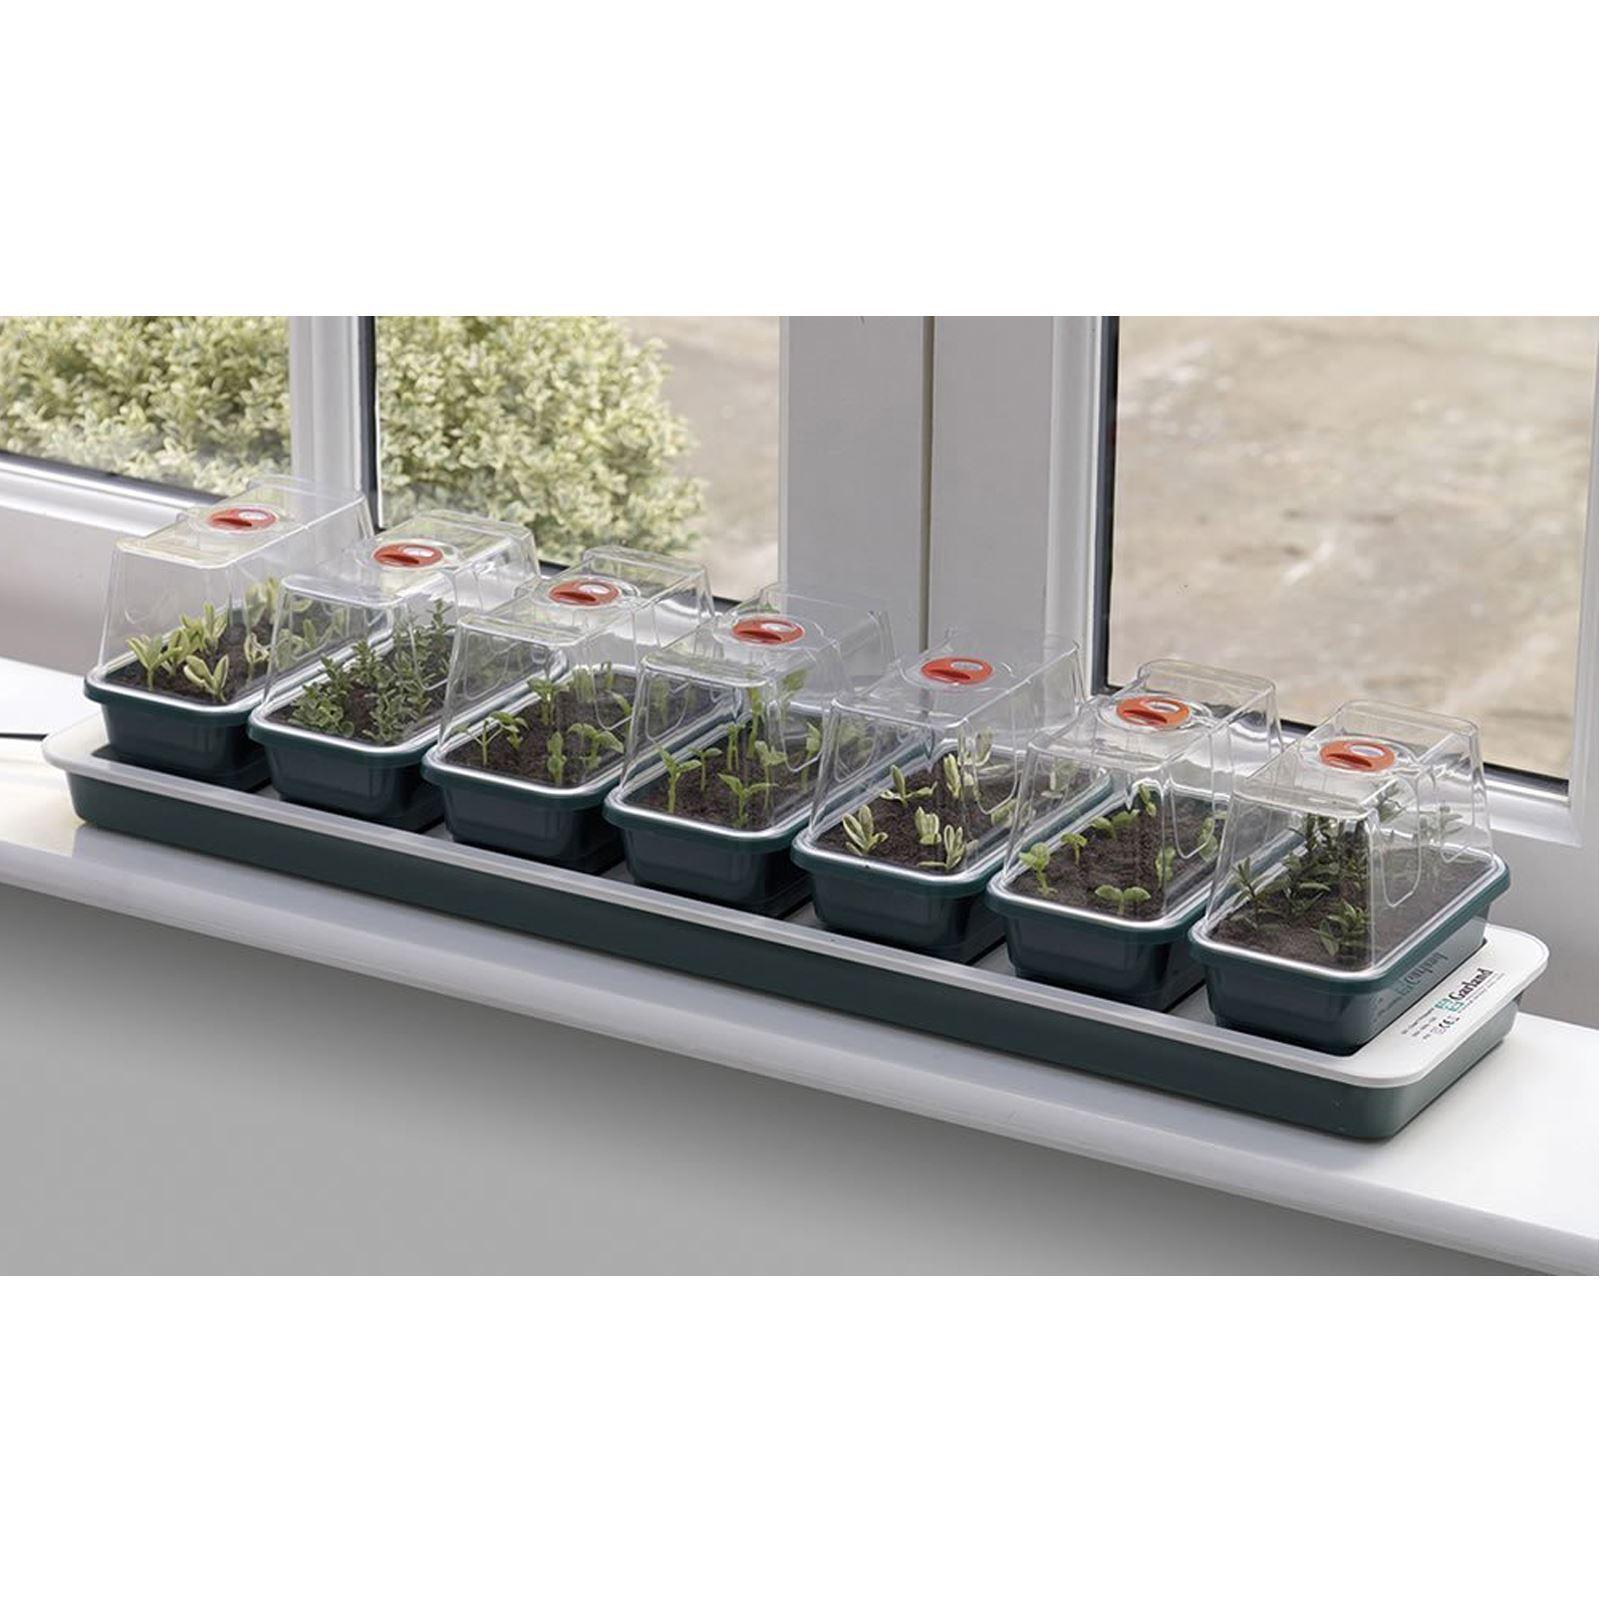 Garland G51 Super 7 Electric Heated Windowsill Propagator Plant Seed Vented Tray £26.71 @ Amos